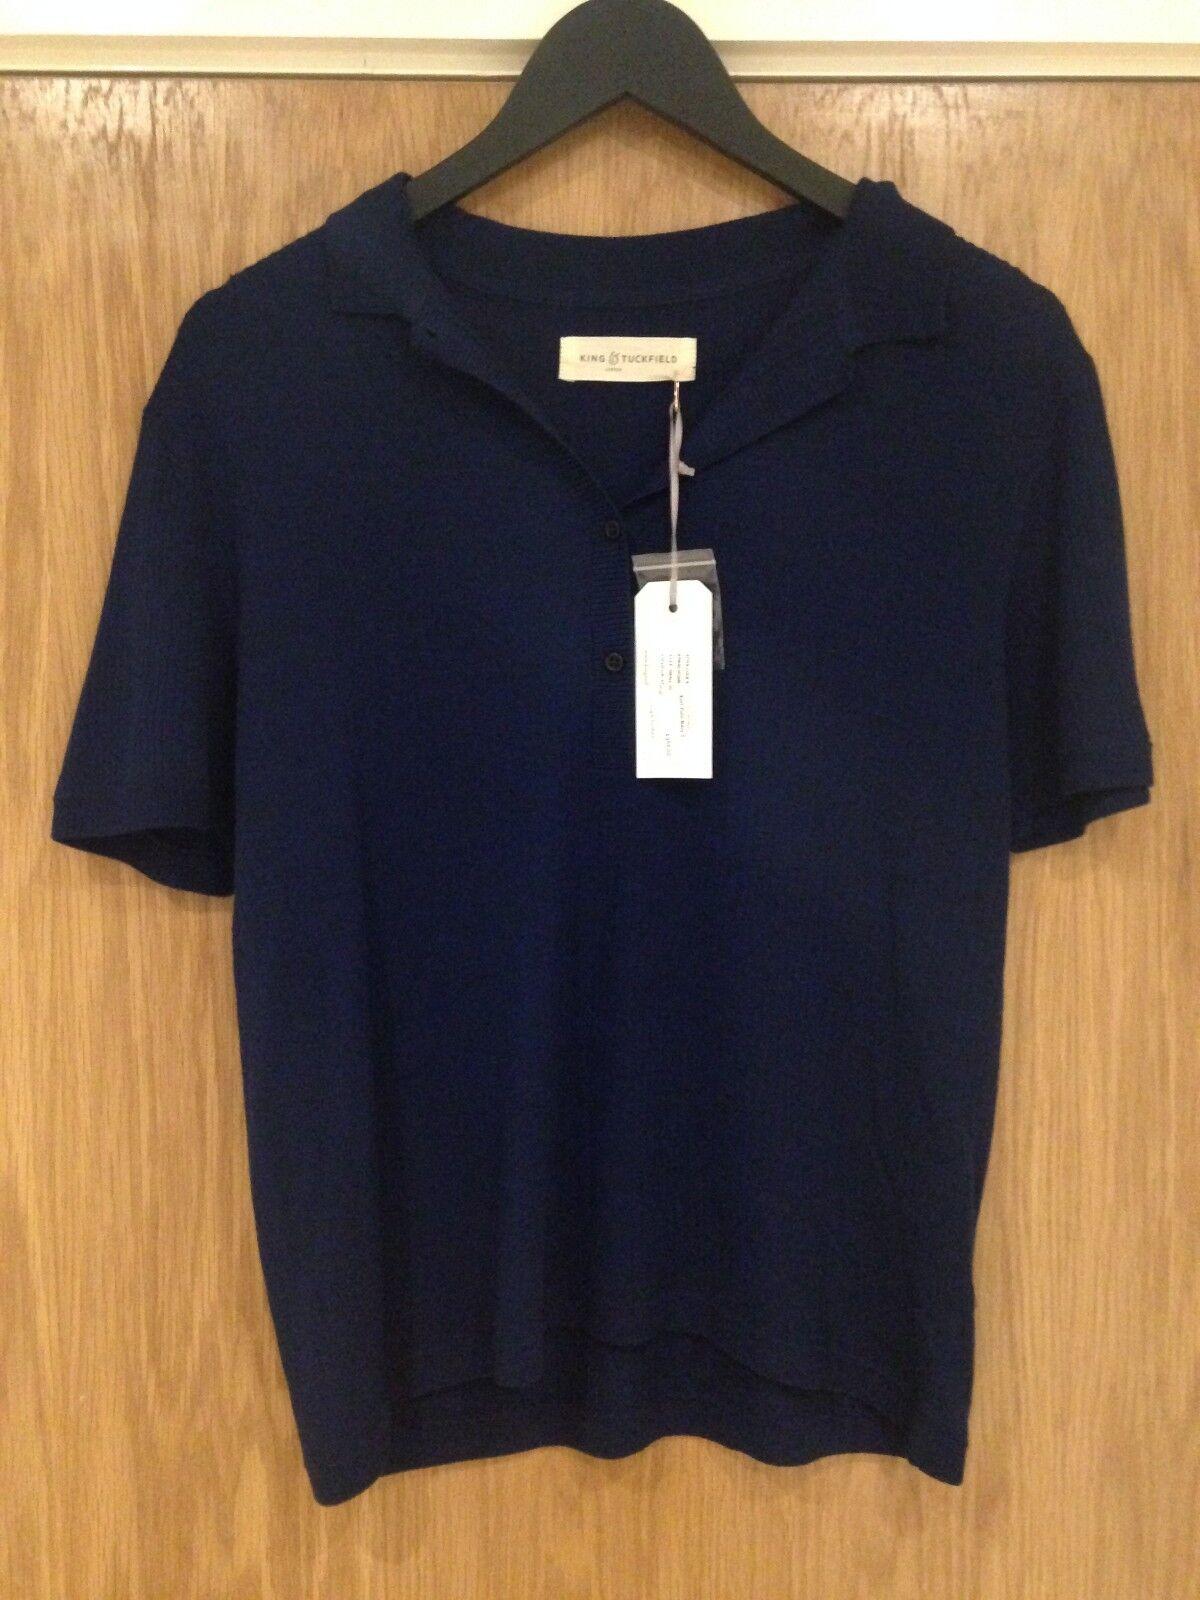 Designer King Tuckfield Woman's Small 100% Marino Navy Blau Polo Shirt BNWT